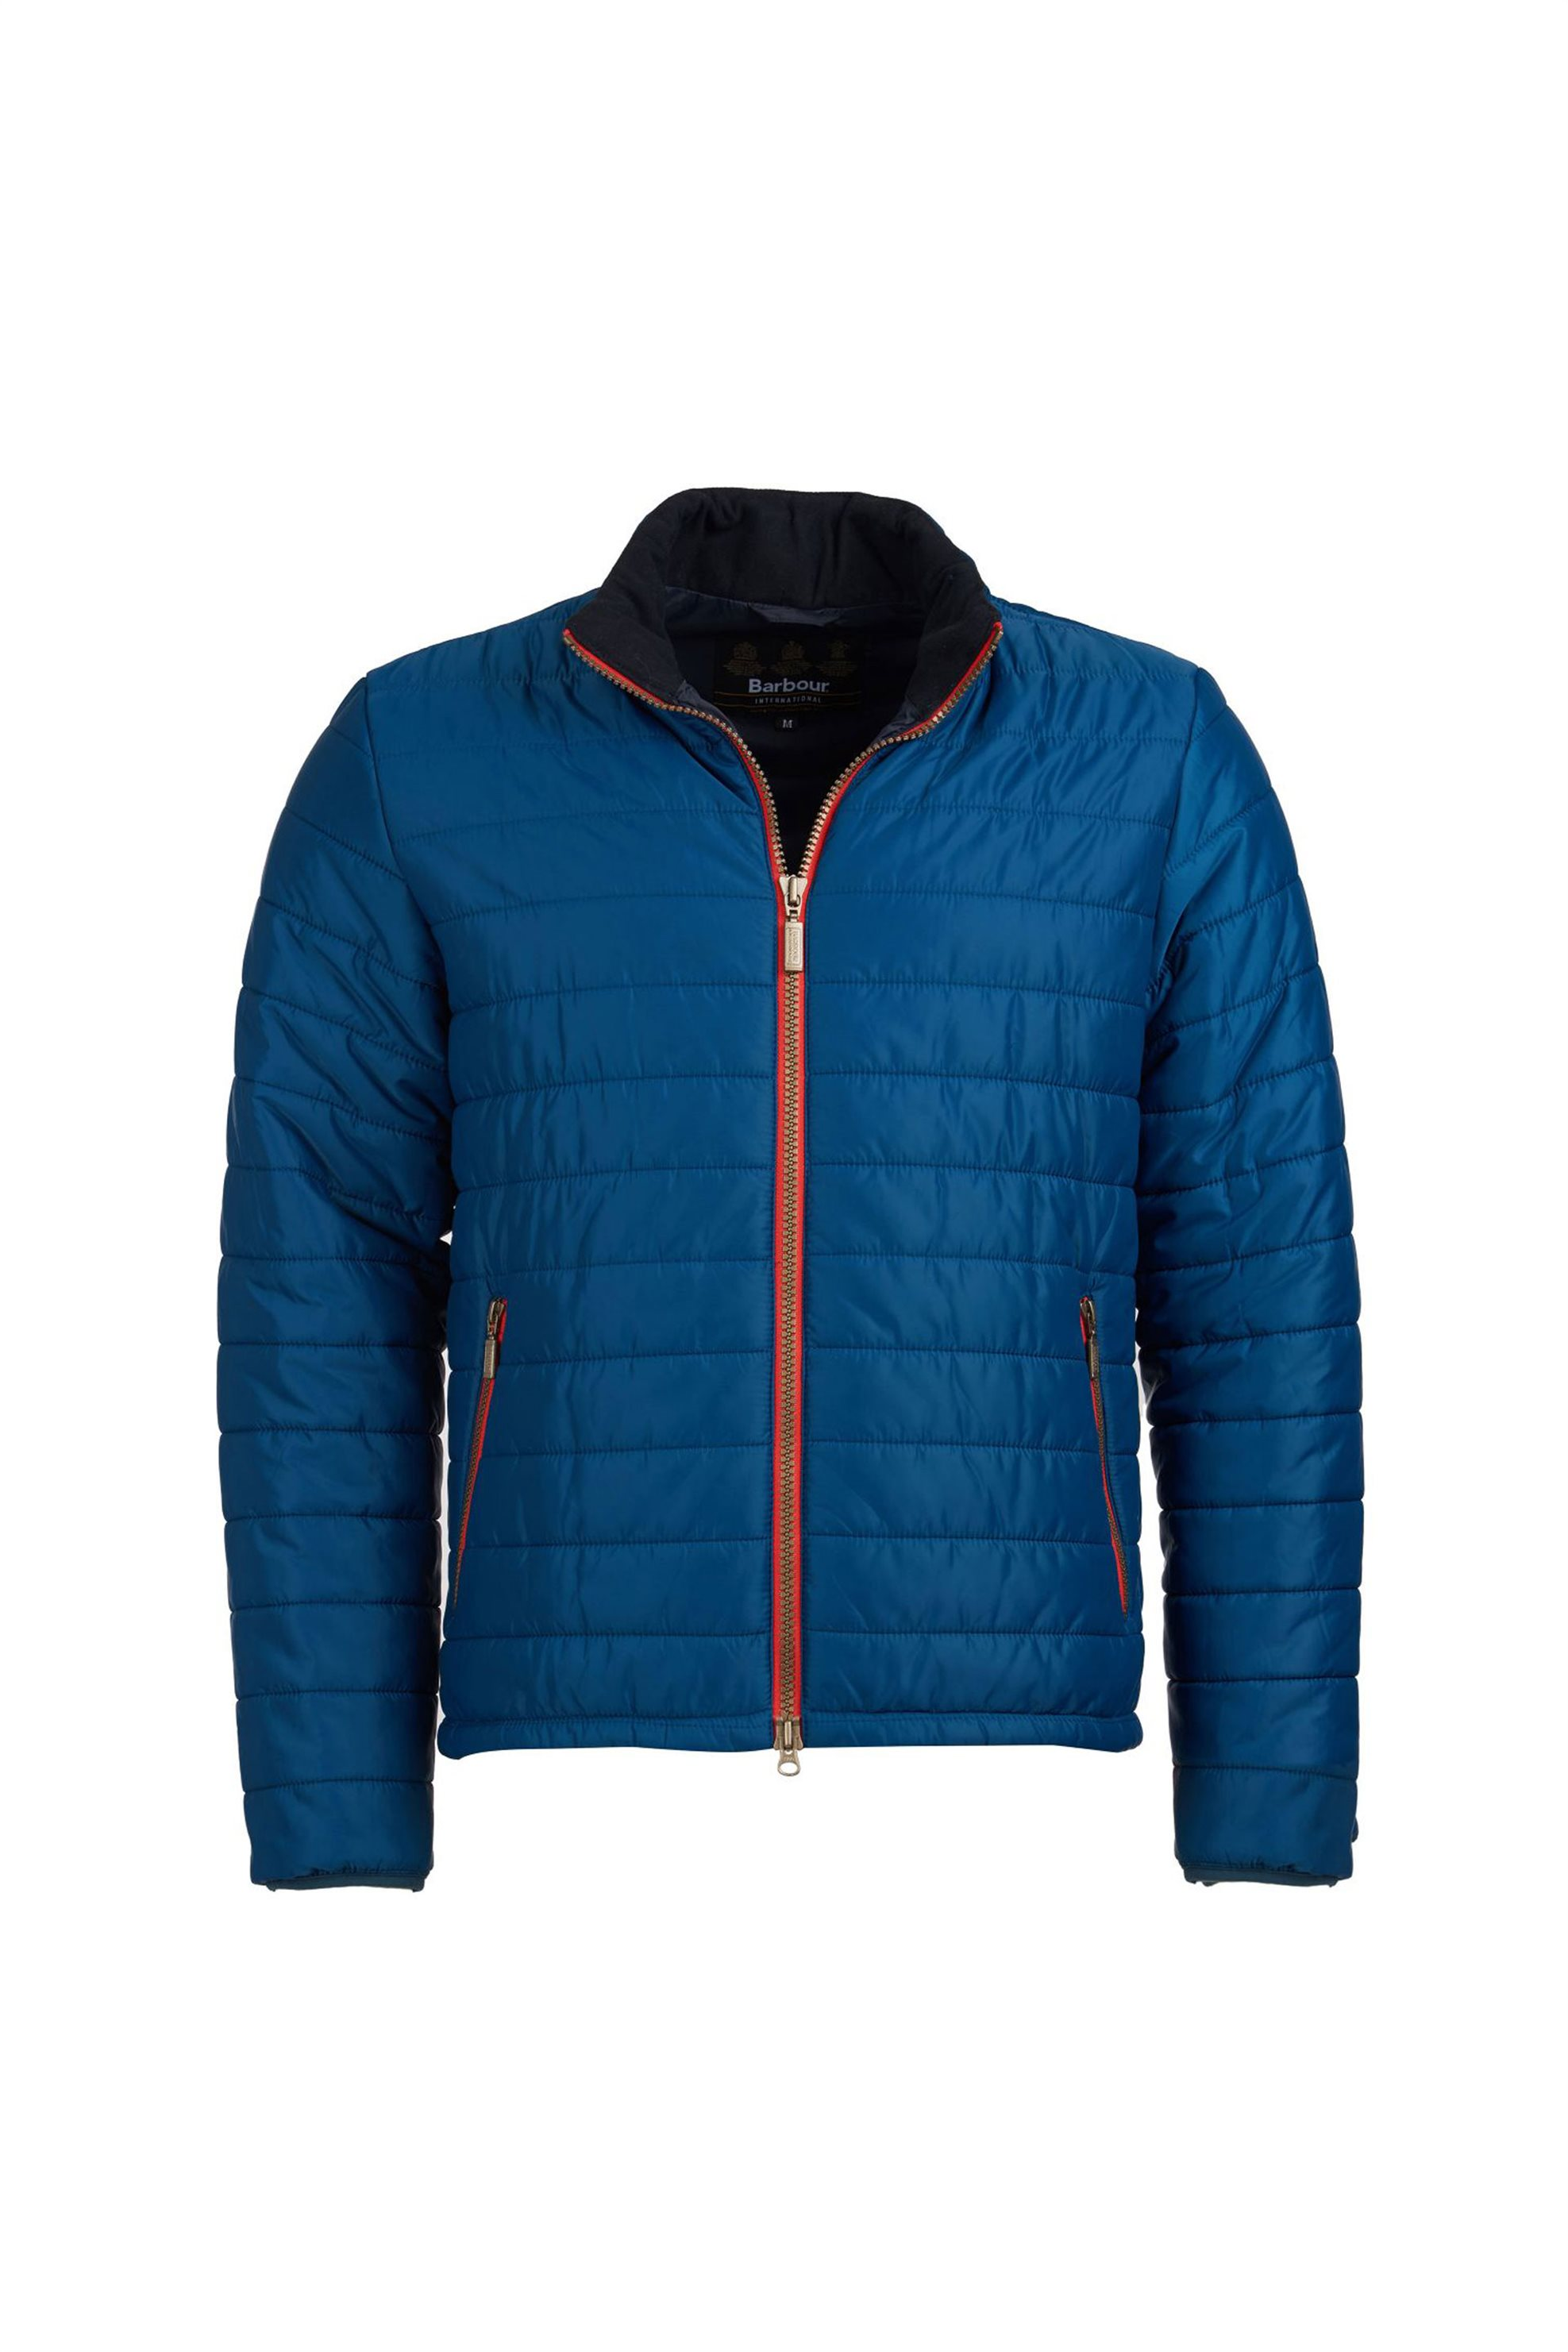 Barbour ανδρικό μπουφάν Locking - MQU1000 - Μπλε a7d2b65d809